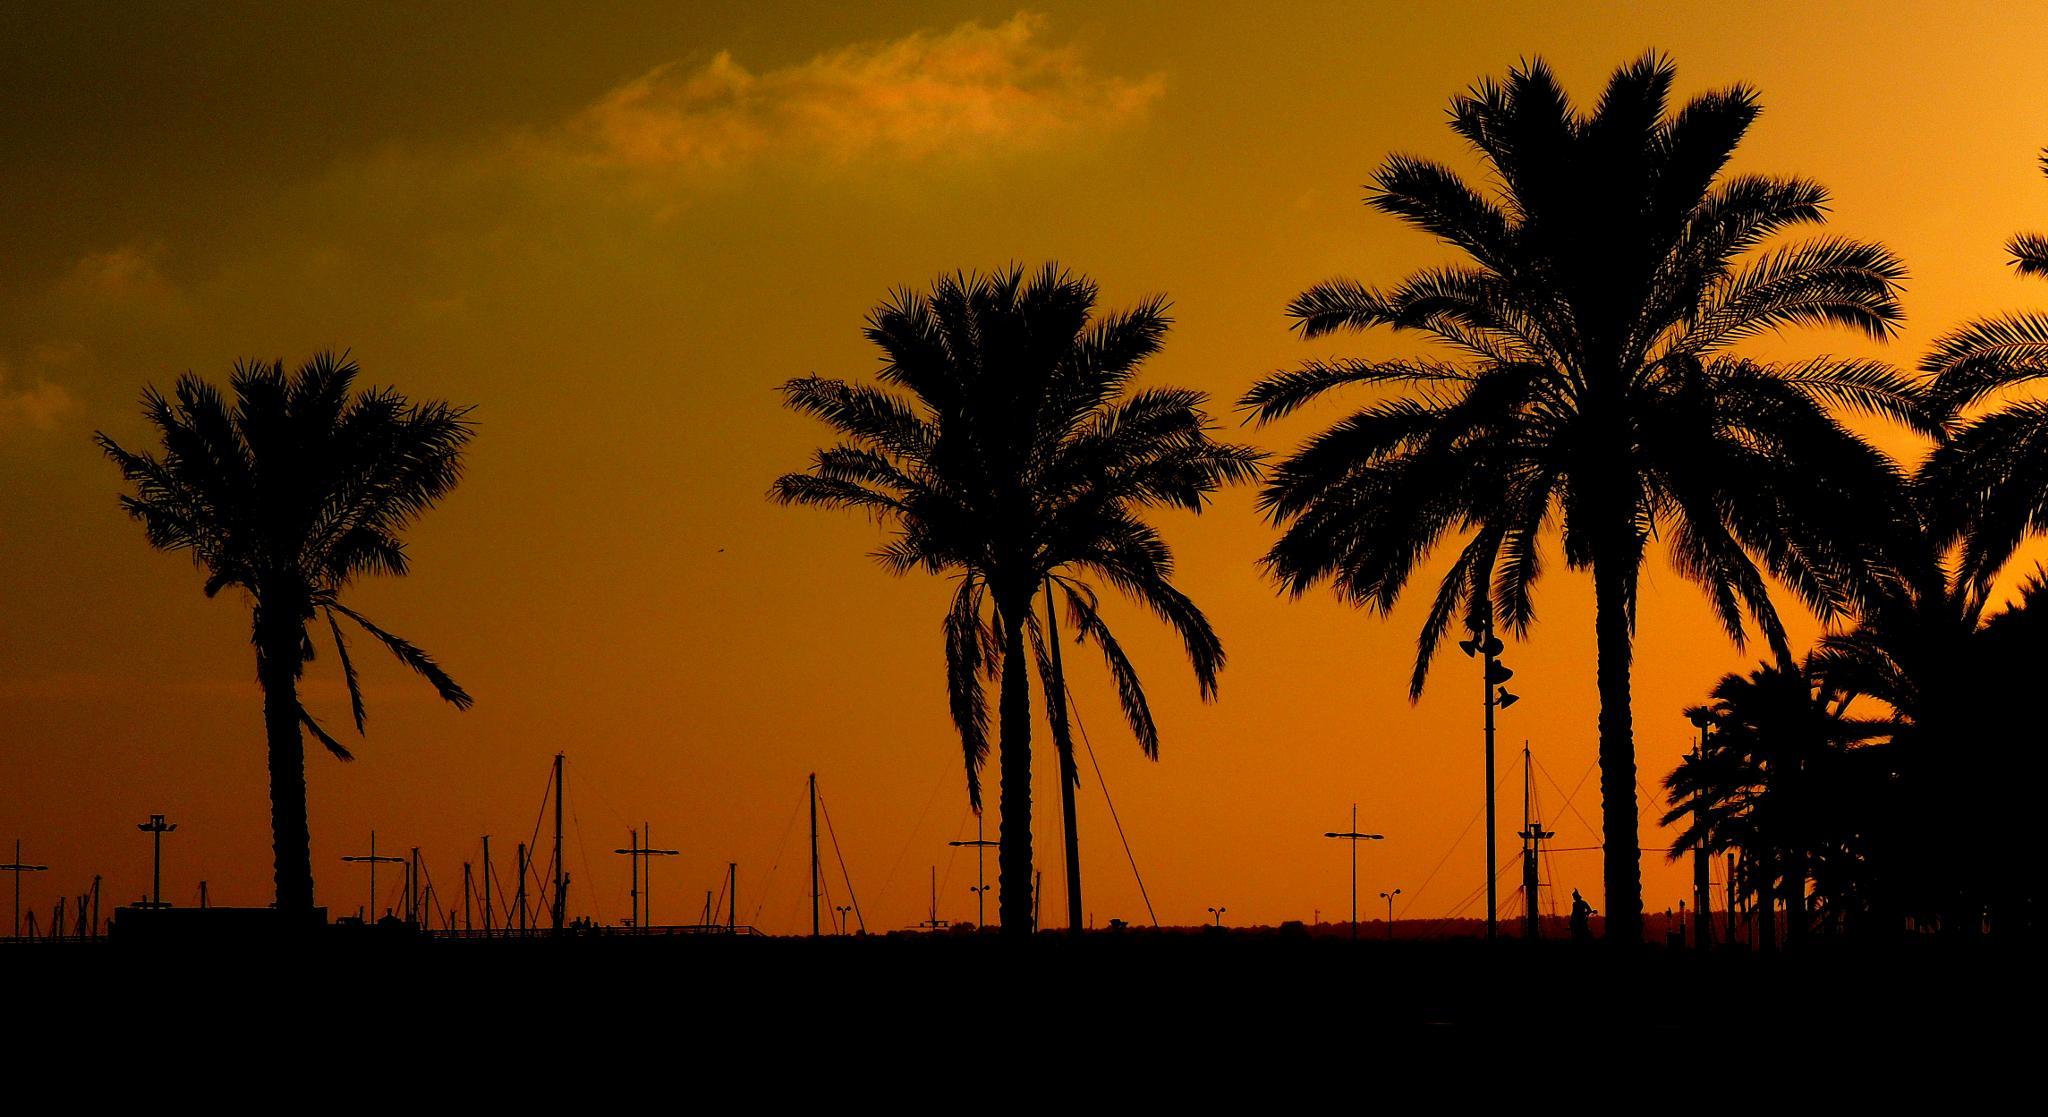 Sunset by Jozsef Keszan